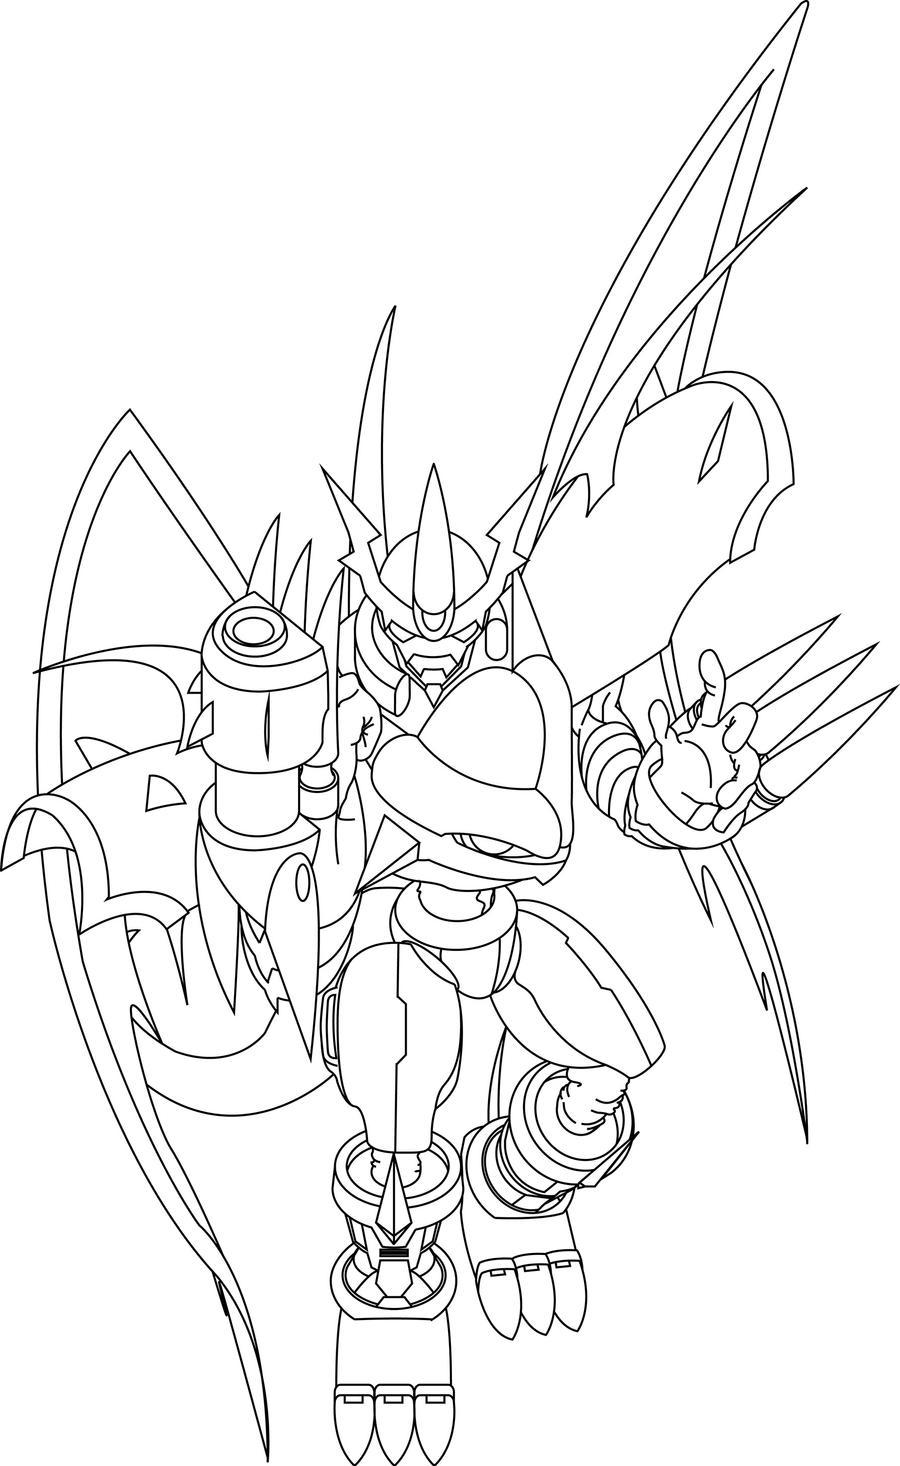 Line Art: Imperialdramon Fighter Mode by Mearns on DeviantArt